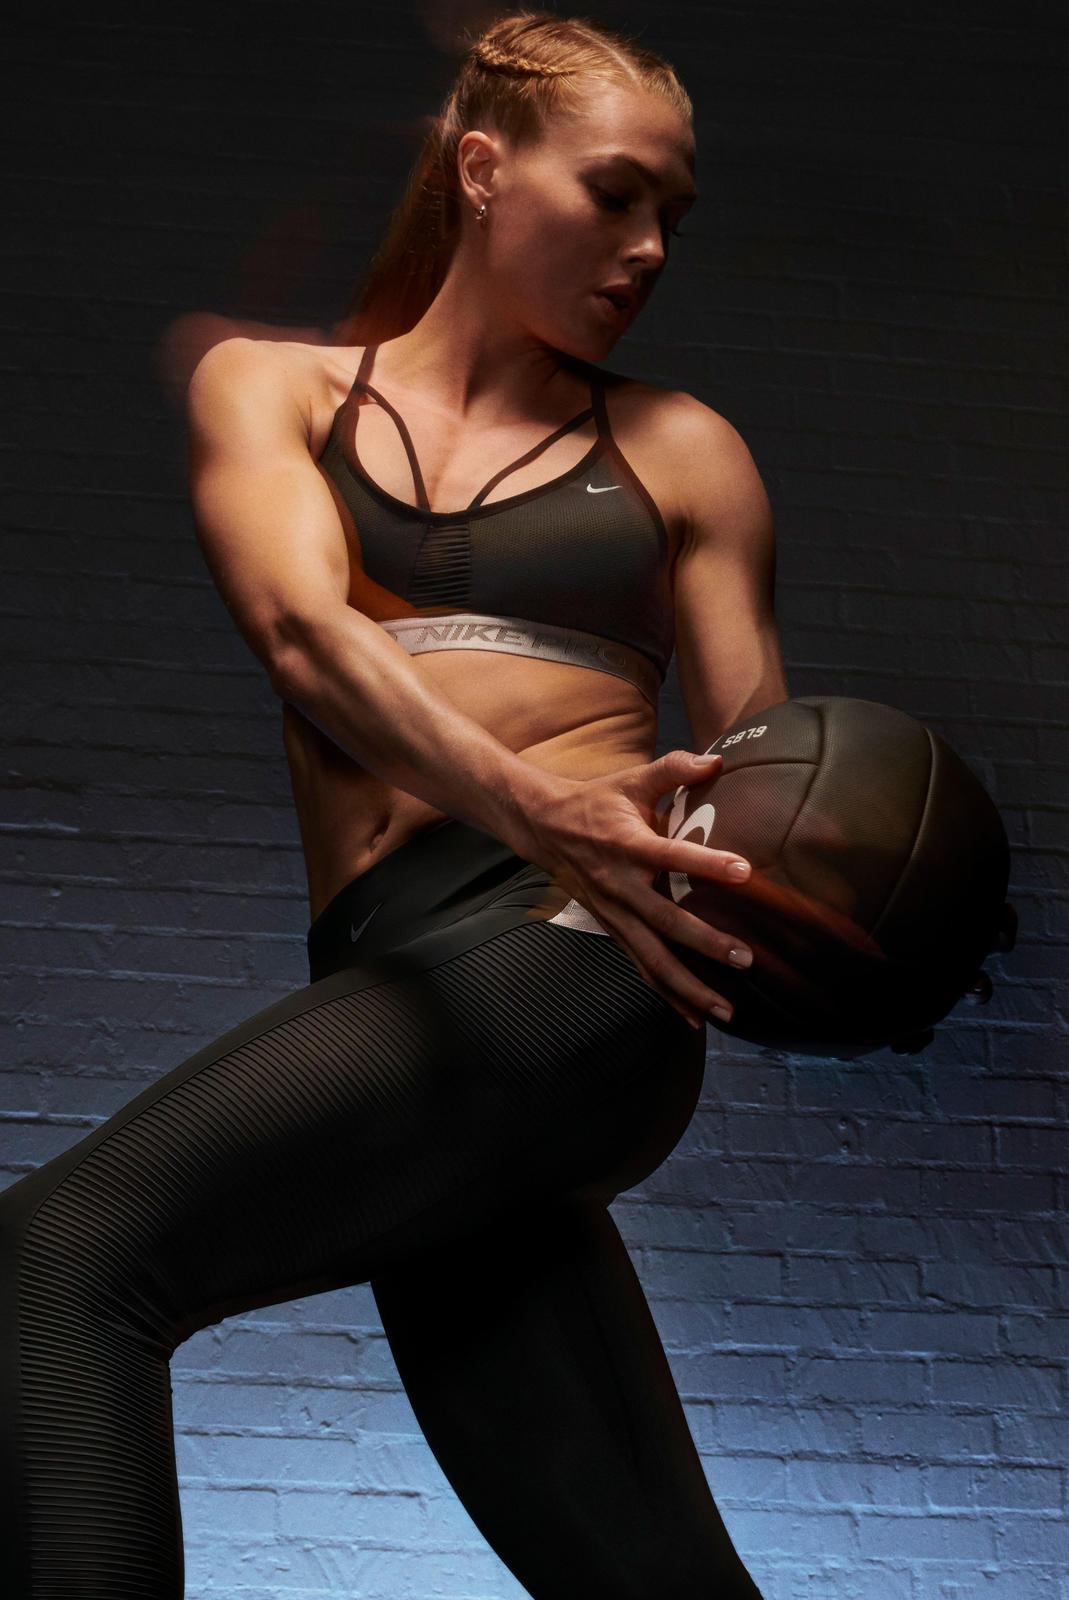 NikeNews_NikeTraining_NikeProCollection_Quigley_4_88790.jpg